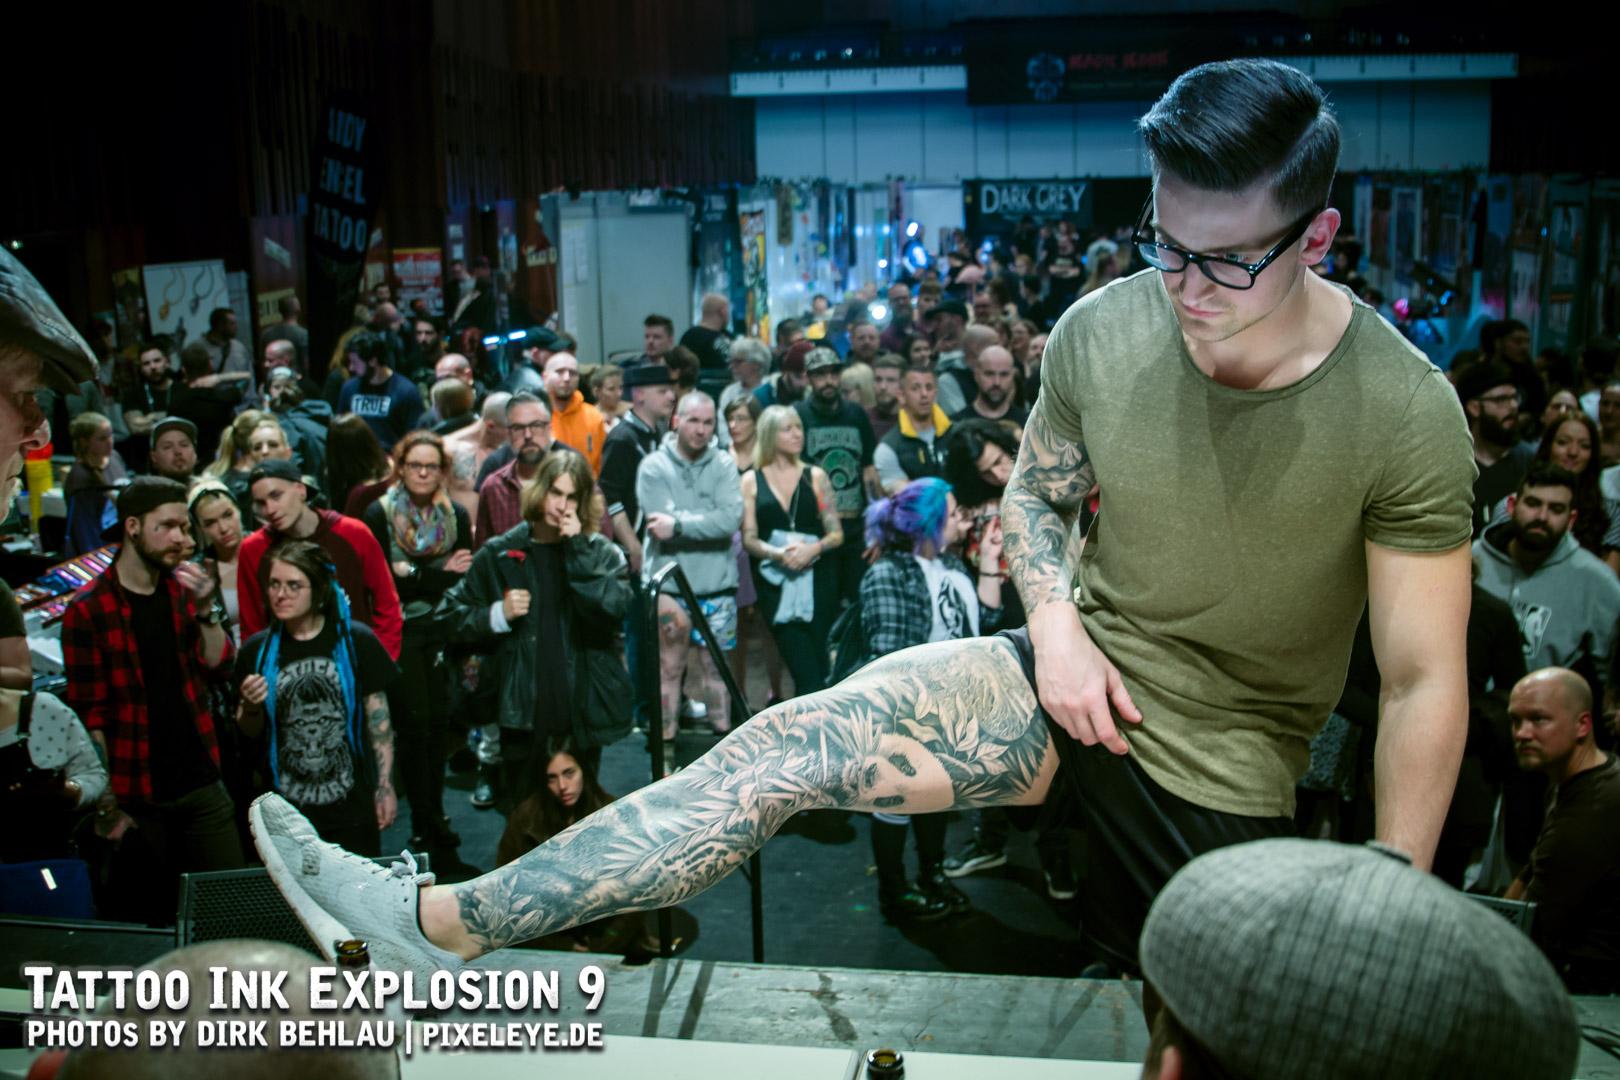 Tattoo Ink Explosion 2018 WEB by Dirk Behlau-0737.jpg